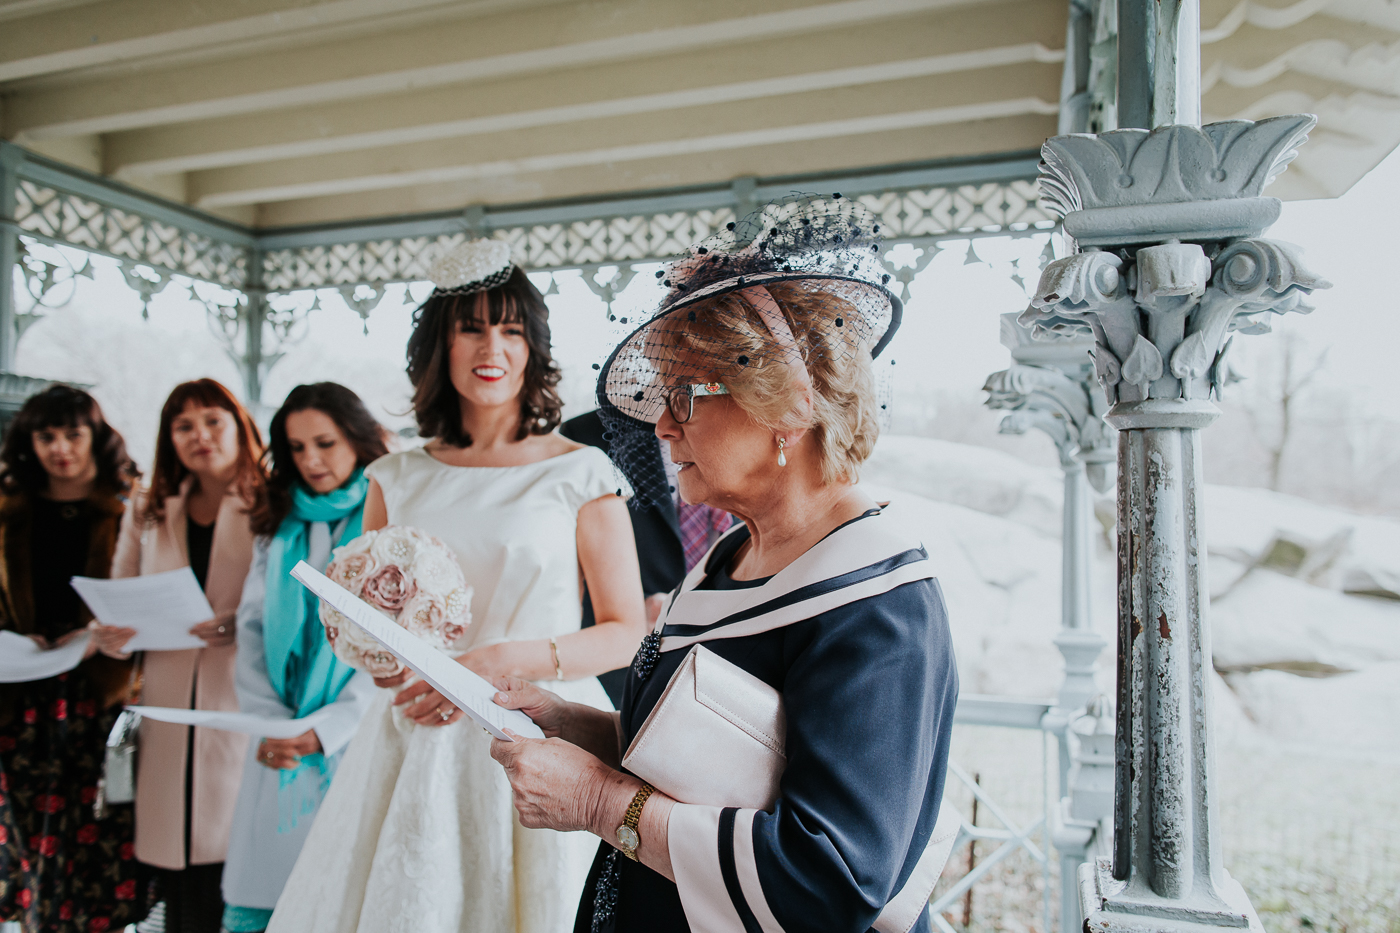 Ladies-Pavilion-Central-Park-NYC-Documentary-Elopement-Wedding-Photographer-23.jpg